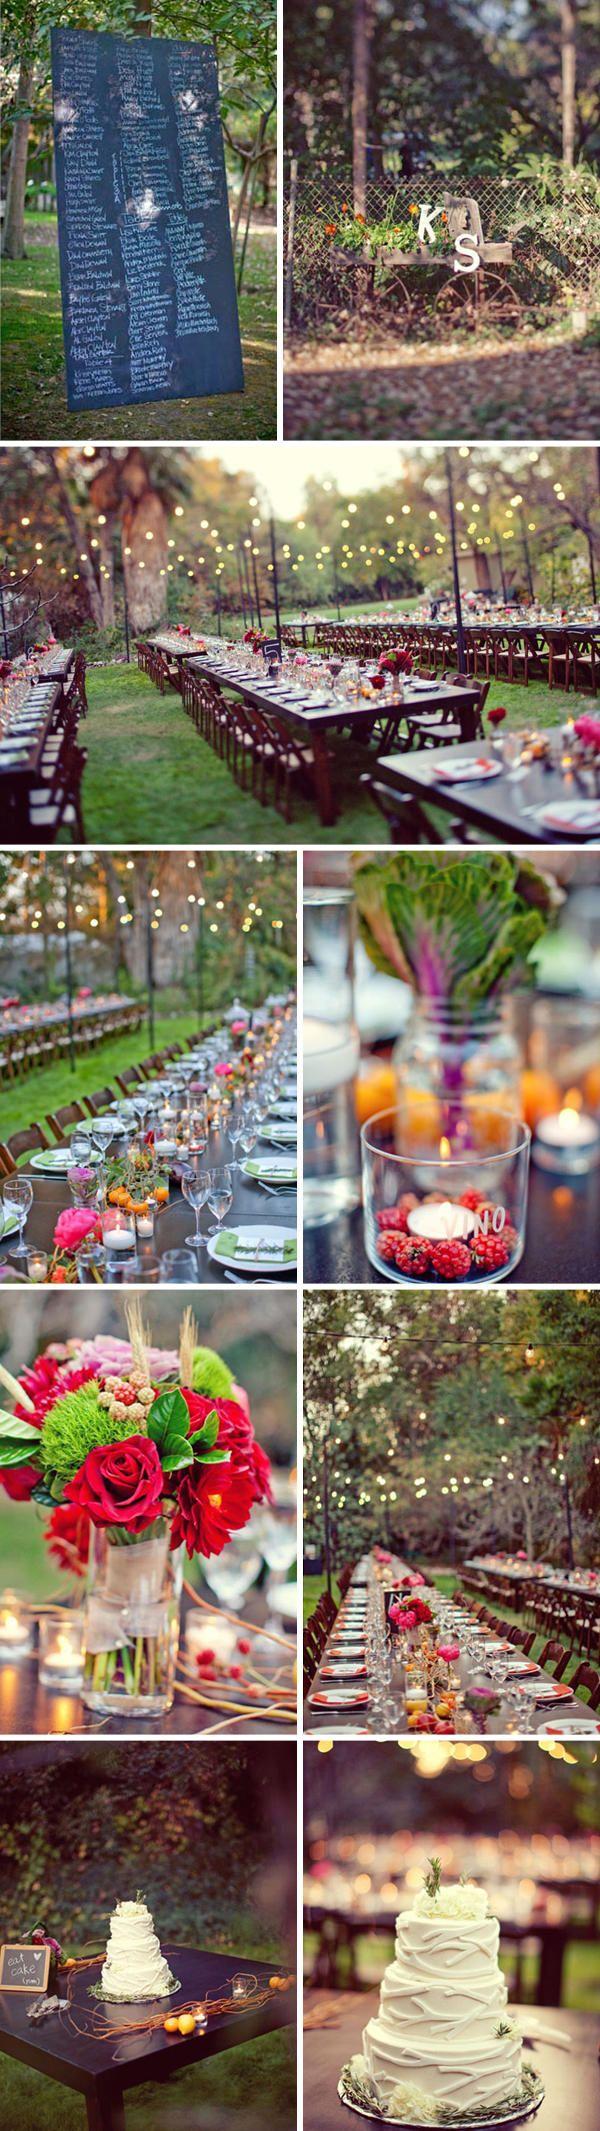 love this backyard wedding idea